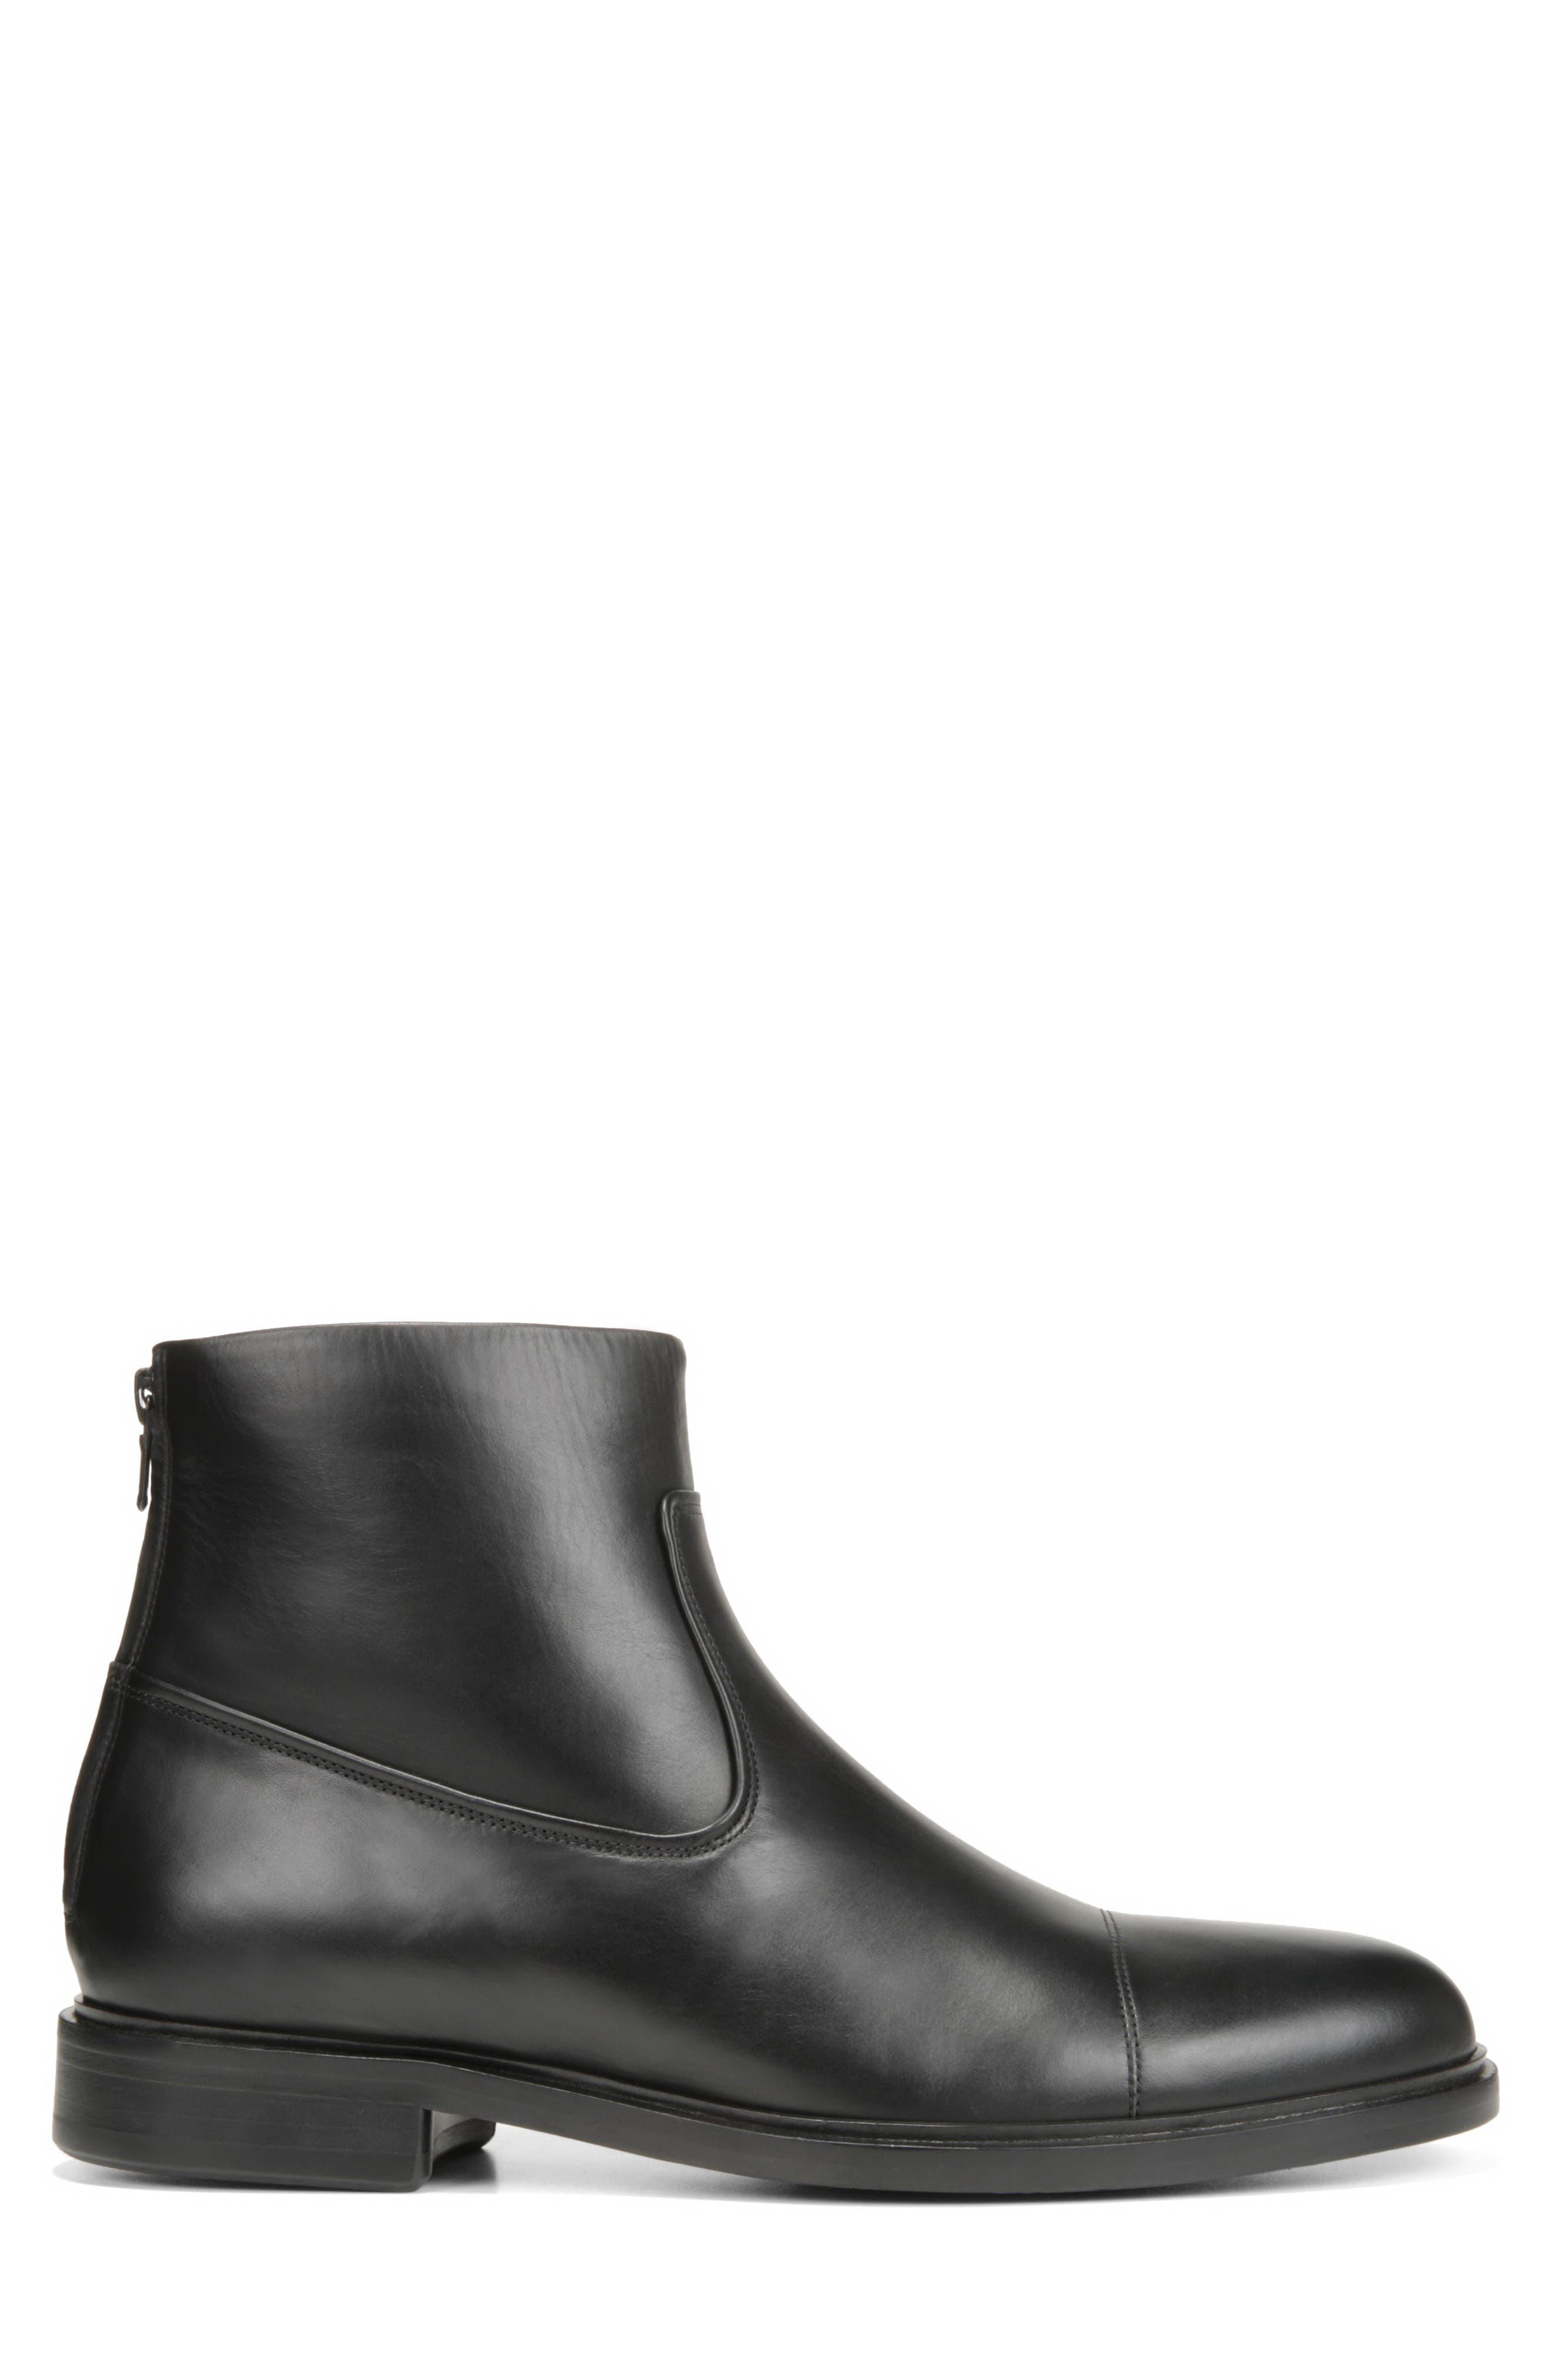 Beckett Zip Boot,                             Alternate thumbnail 3, color,                             BLACK